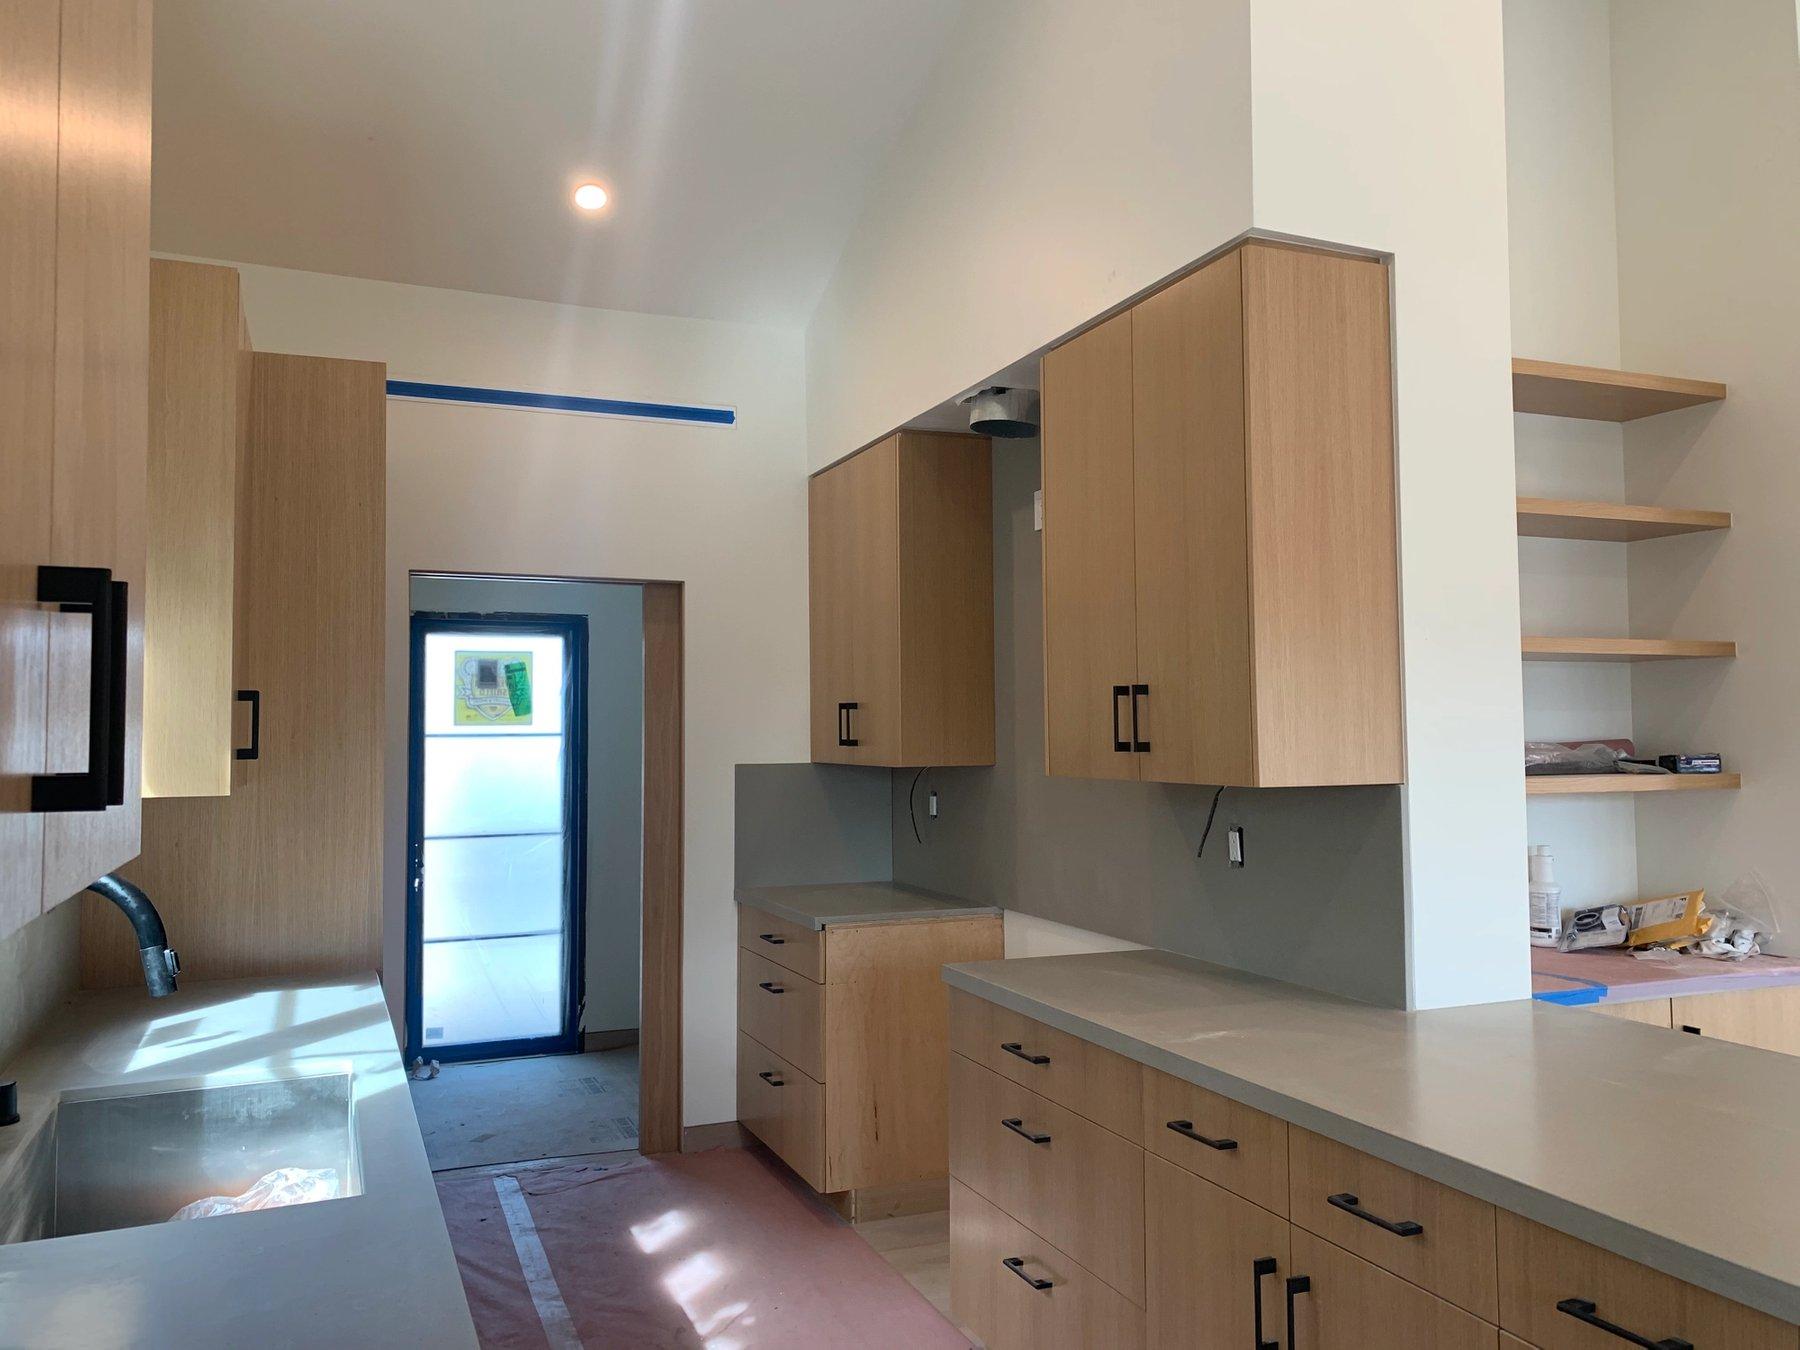 White oak kitchen cabinets and quartz counters